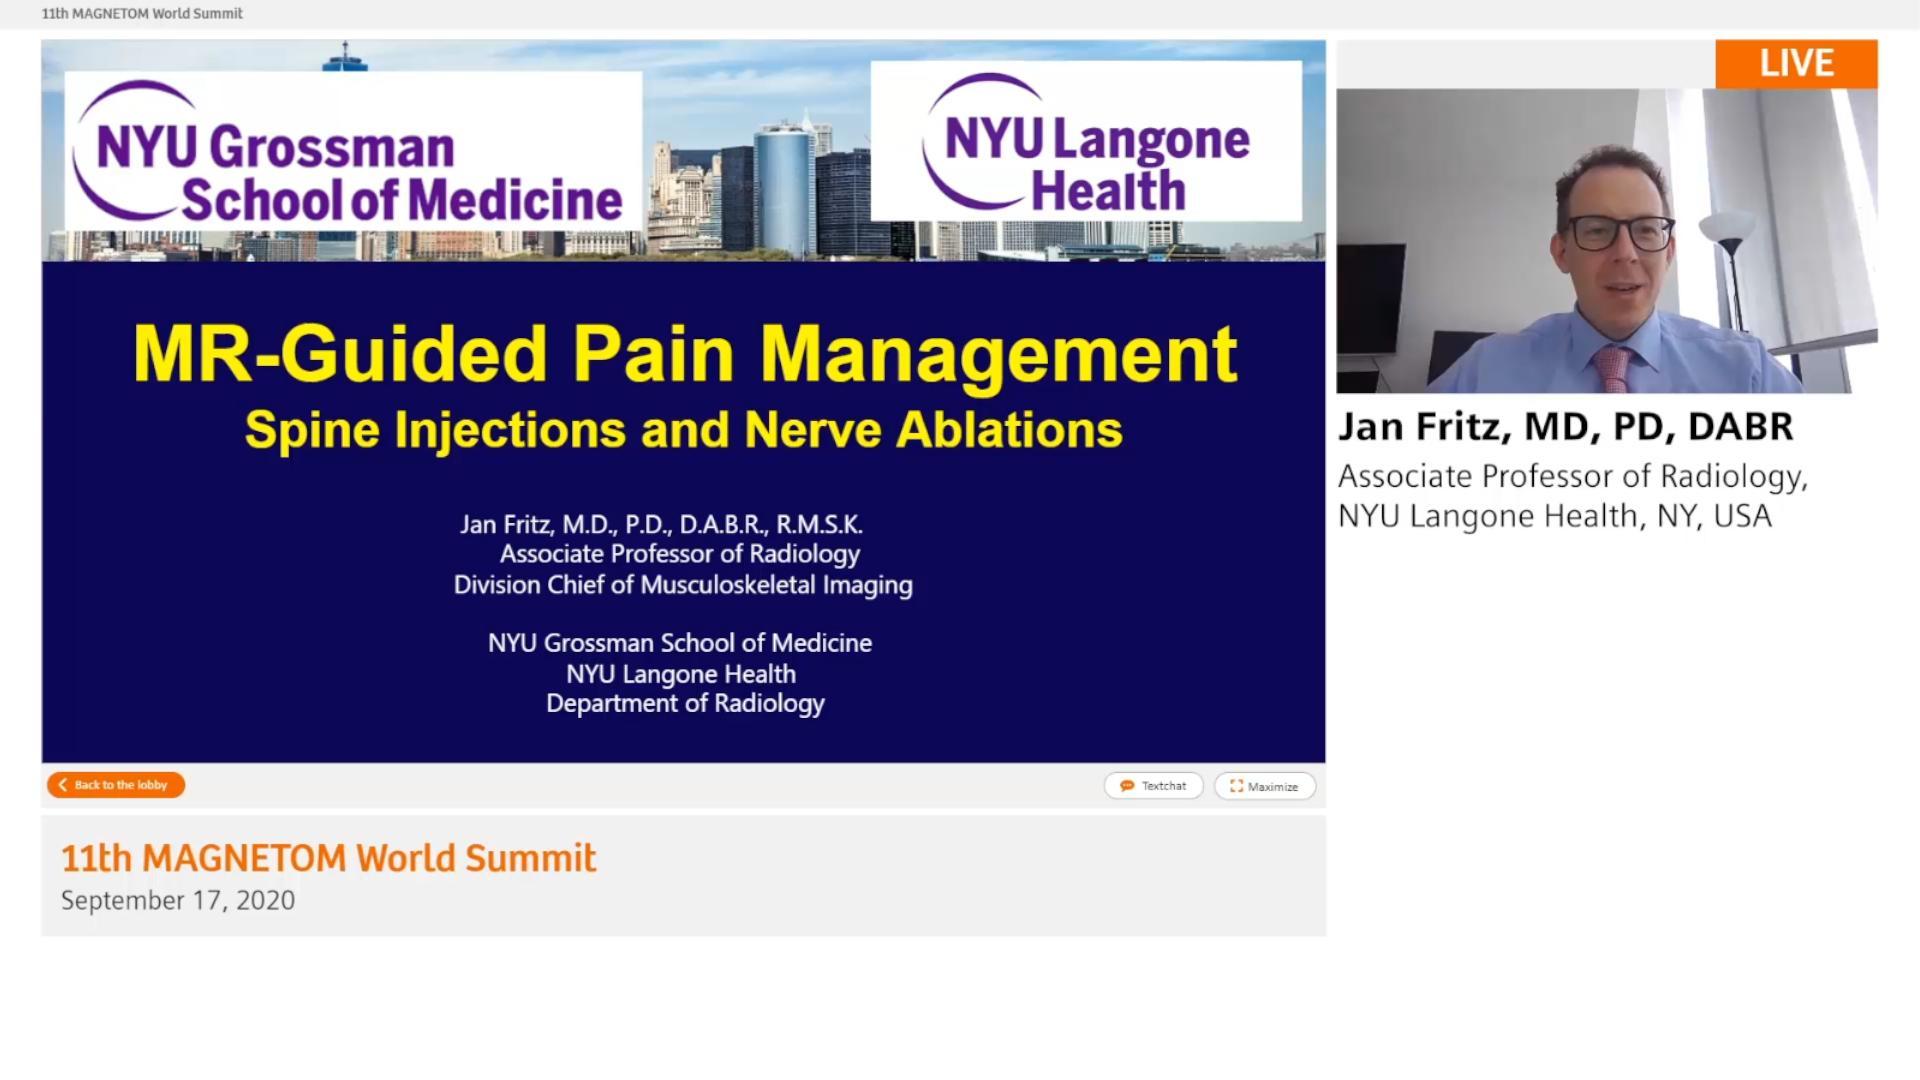 Preview Clinical Talk Jan Fritz